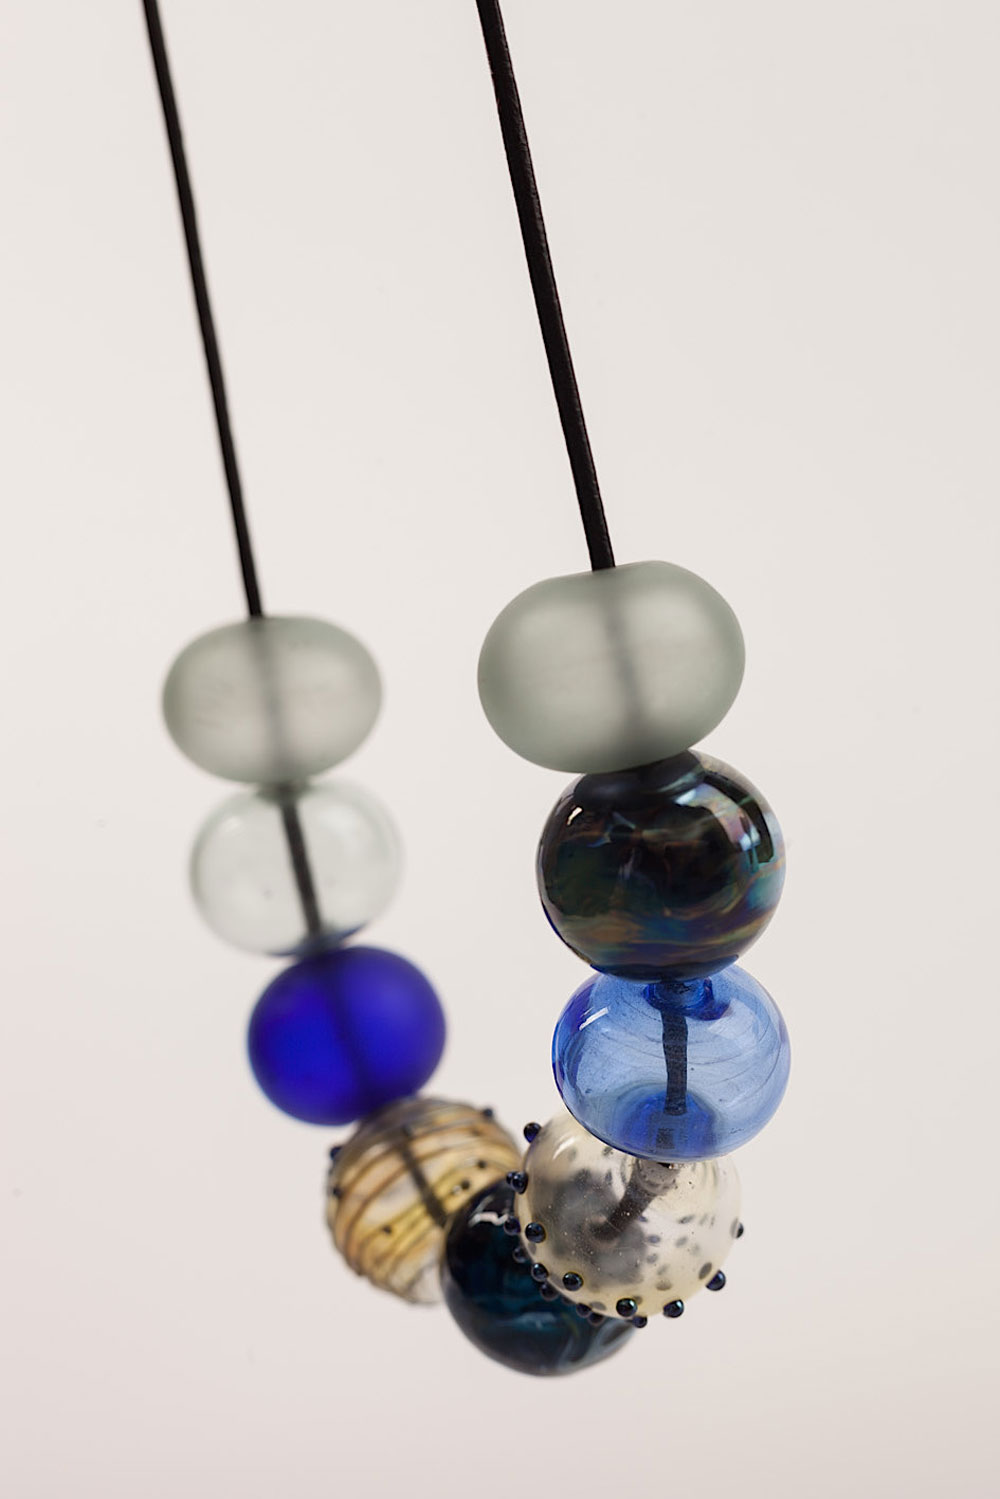 mcm-dehors-toutes-marie-christine-marovelli-creation-collier-verre